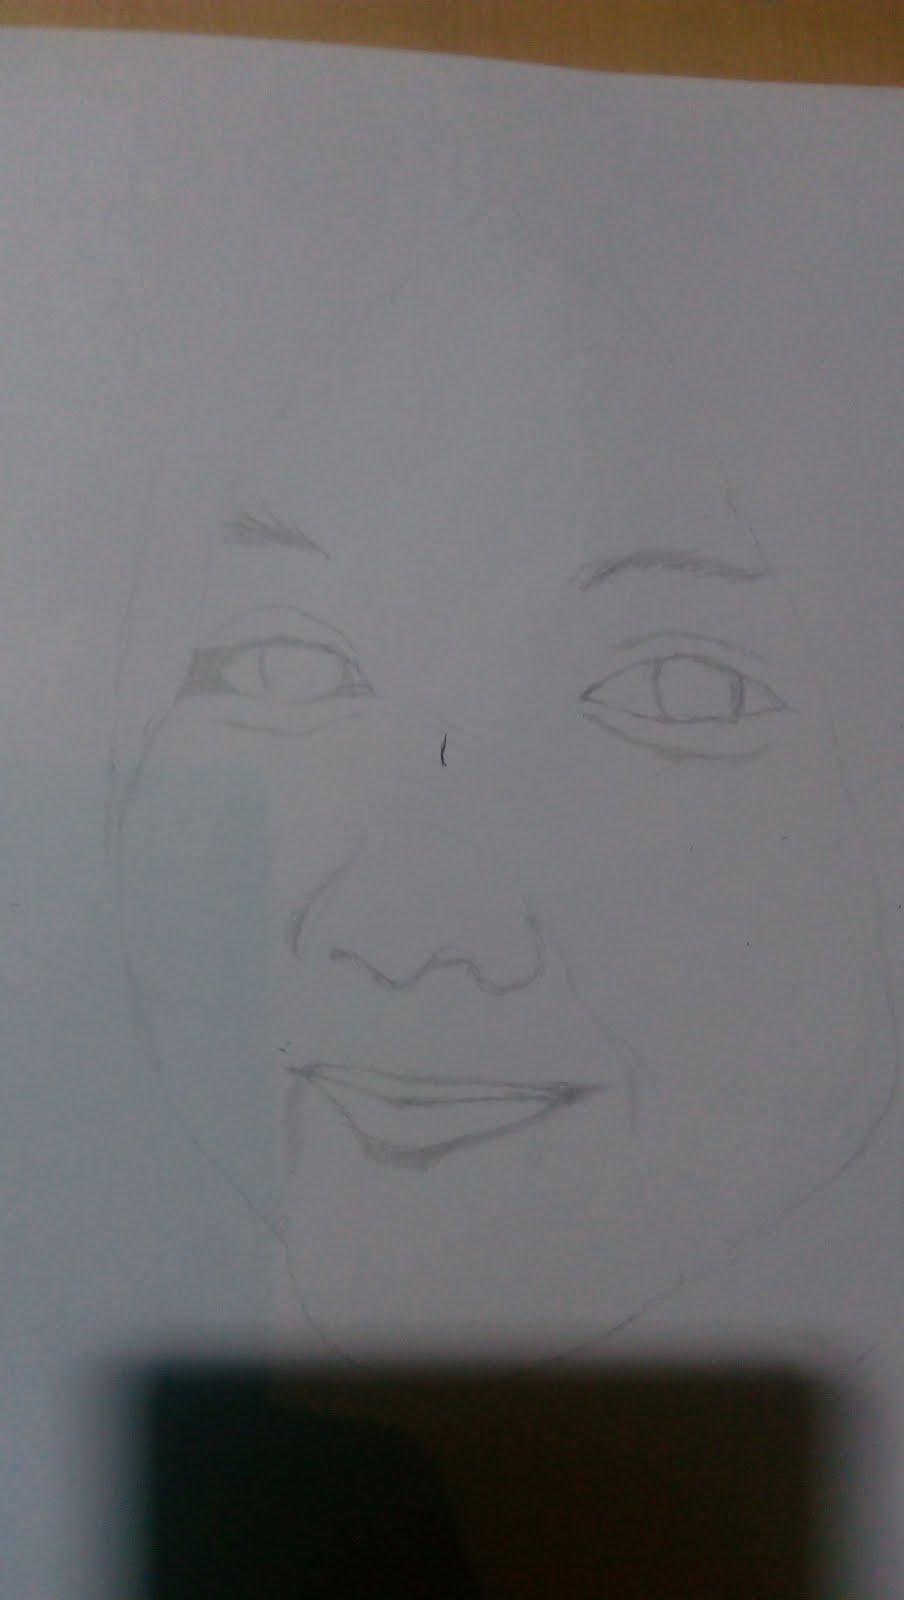 Menggambar Sketsa Wajah Perempuan Kerudung Artit Sawawa